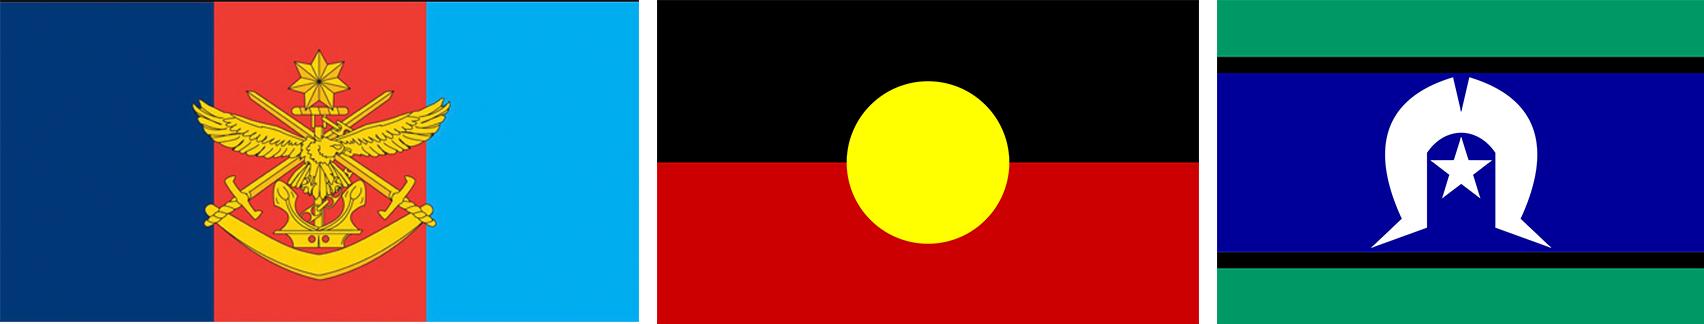 australie 09